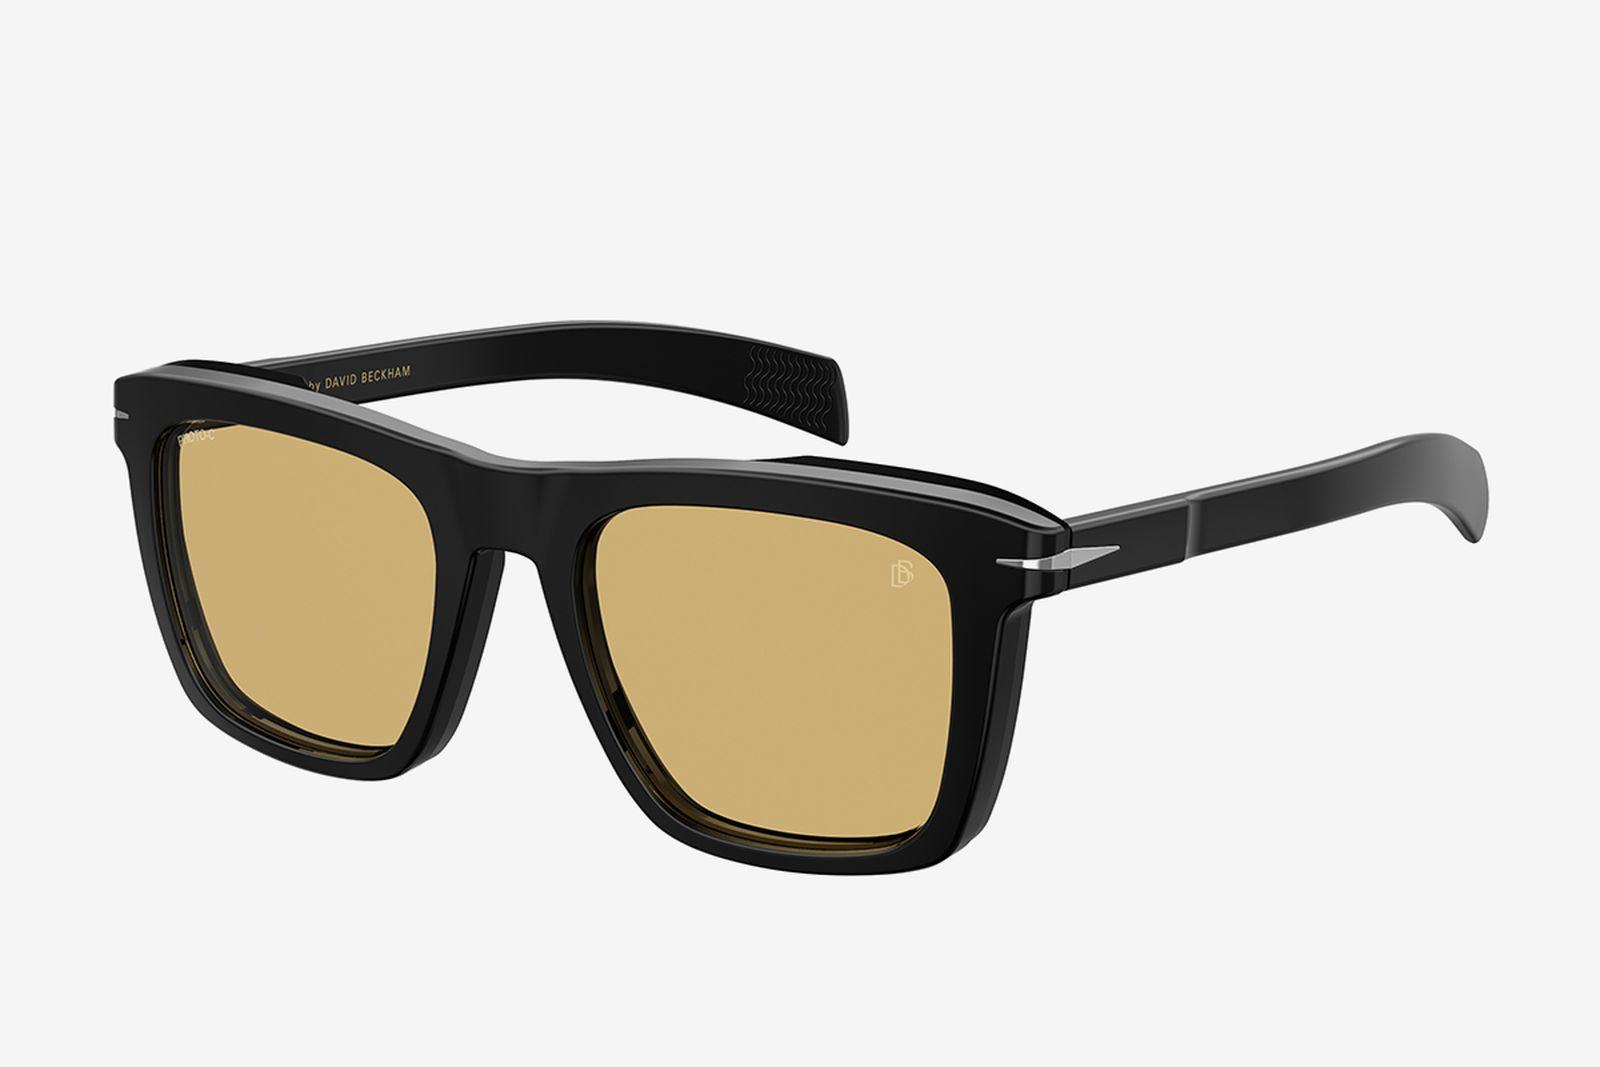 db-sunglasses-ss20-05